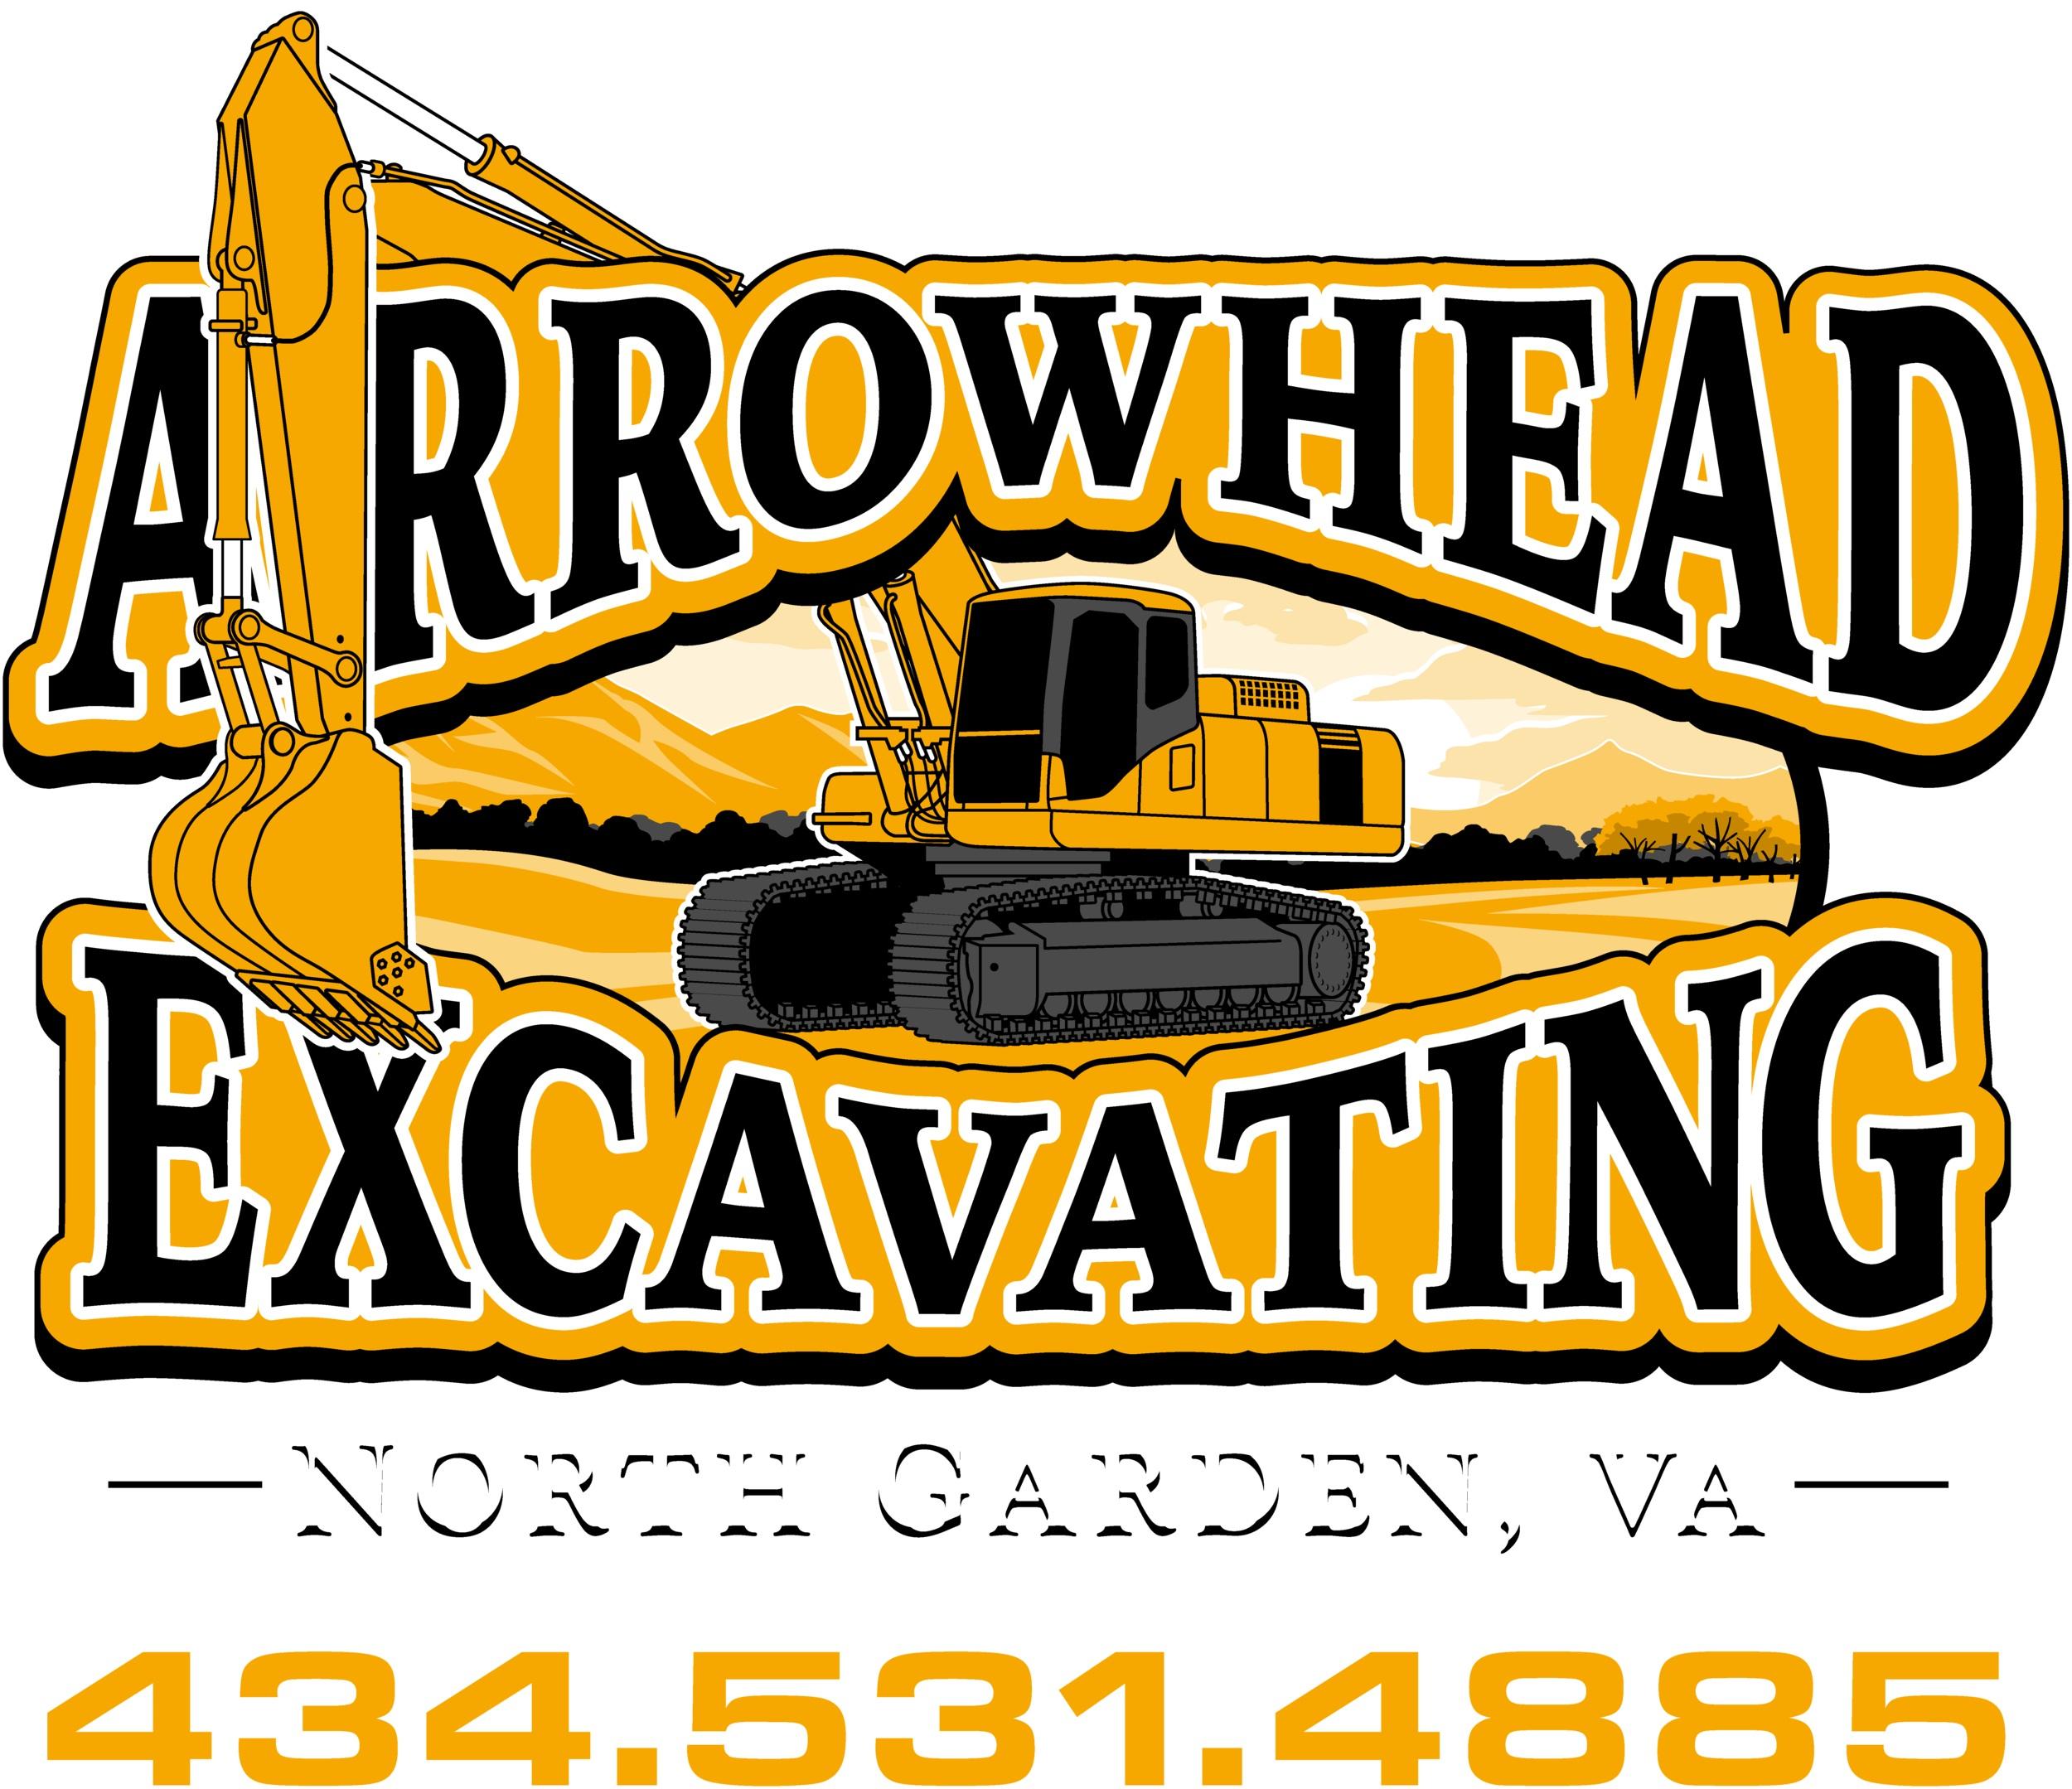 Copy of ArrowheadExcavating_b.png